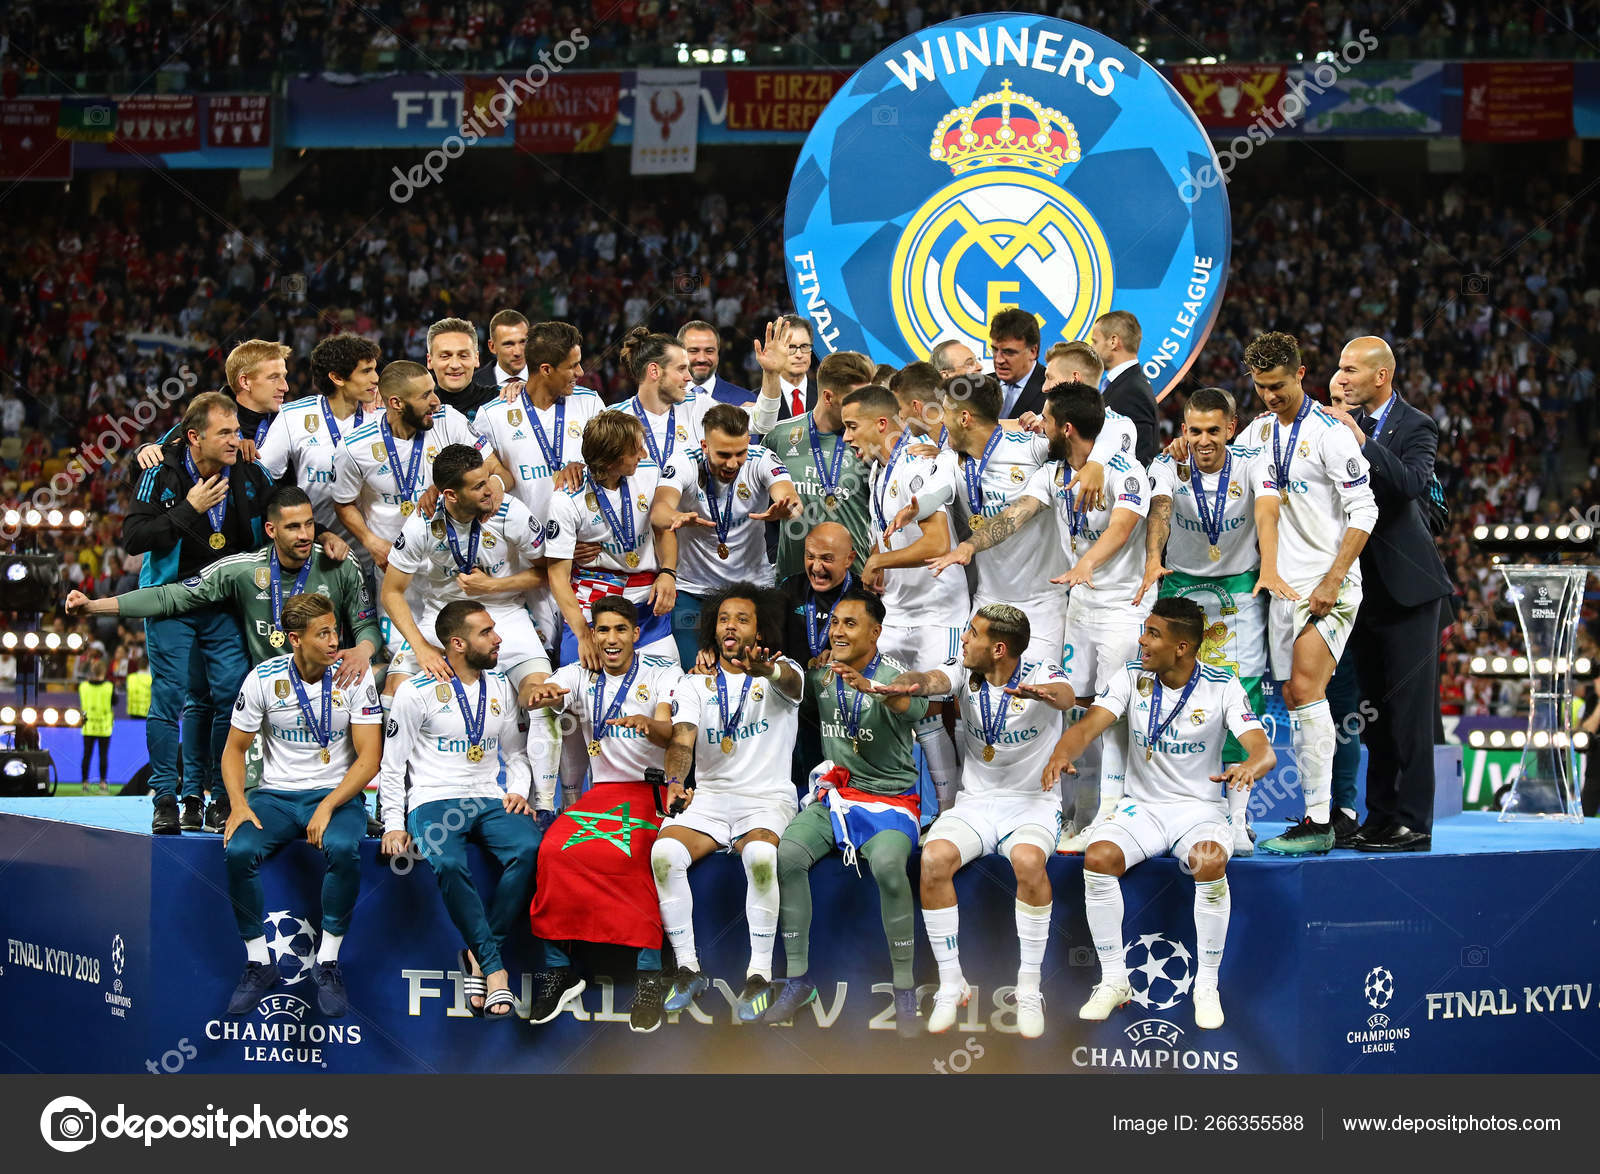 uefa champions league final 2018 real madrid v liverpool stock editorial photo c katatonia82 266355588 https depositphotos com 266355588 stock photo uefa champions league final 2018 html